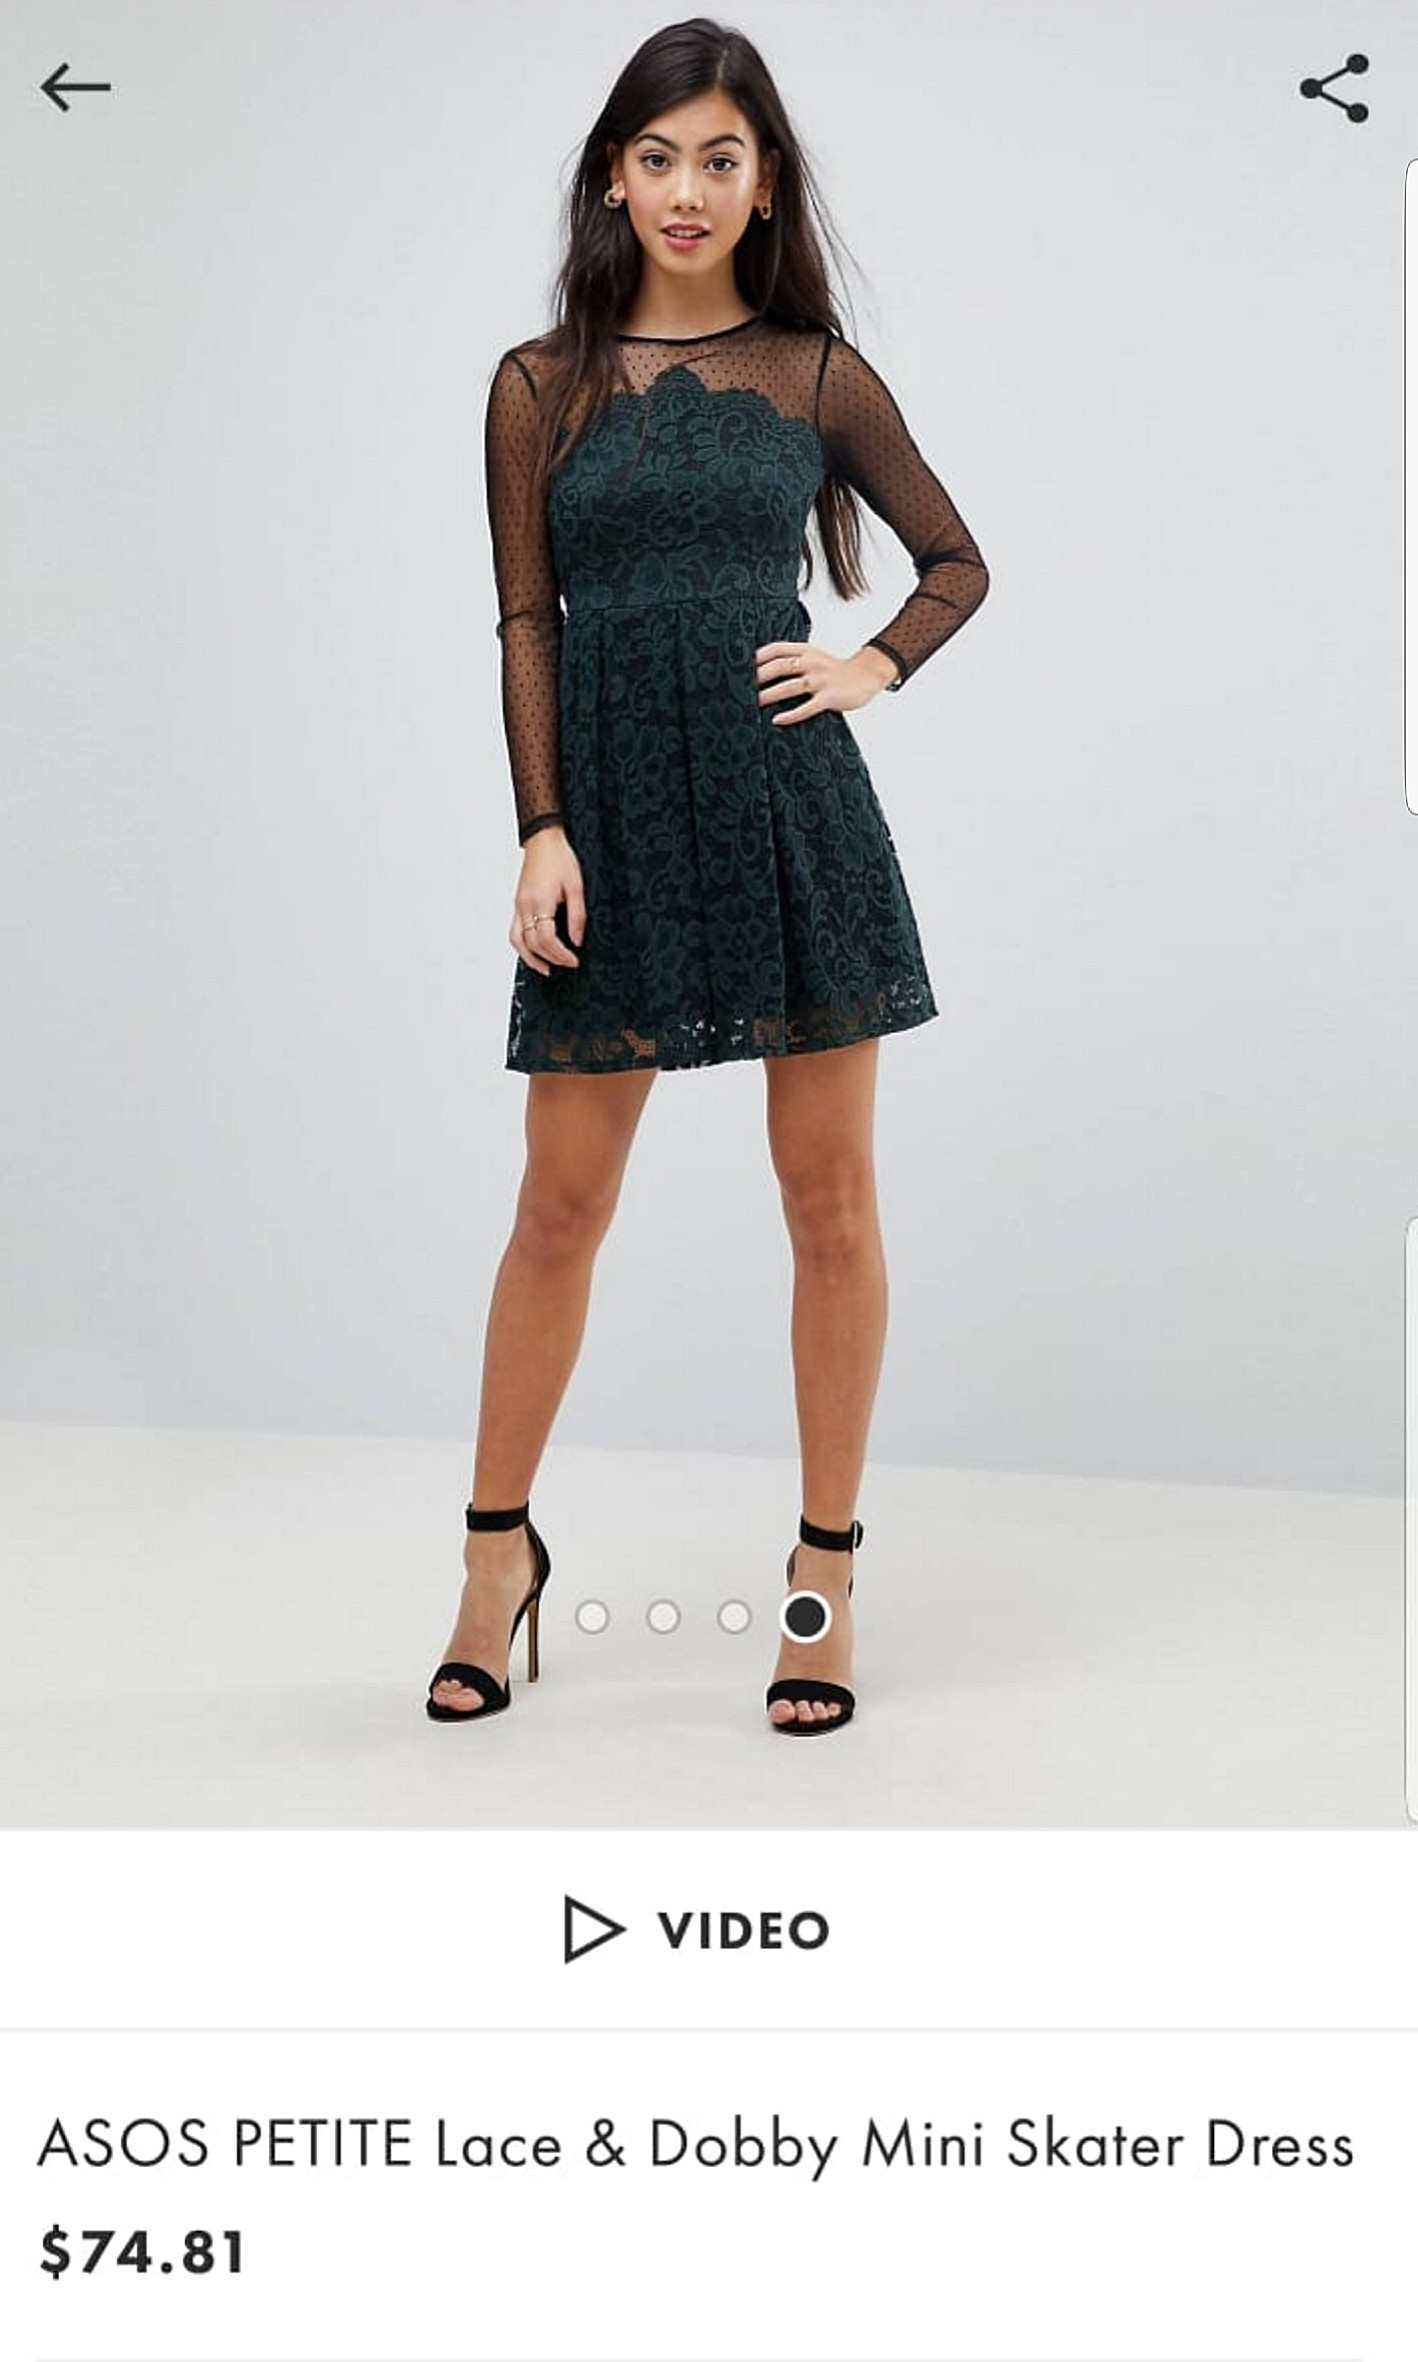 745661bc9aa Asos Petite Lace Skater Dress - Data Dynamic AG